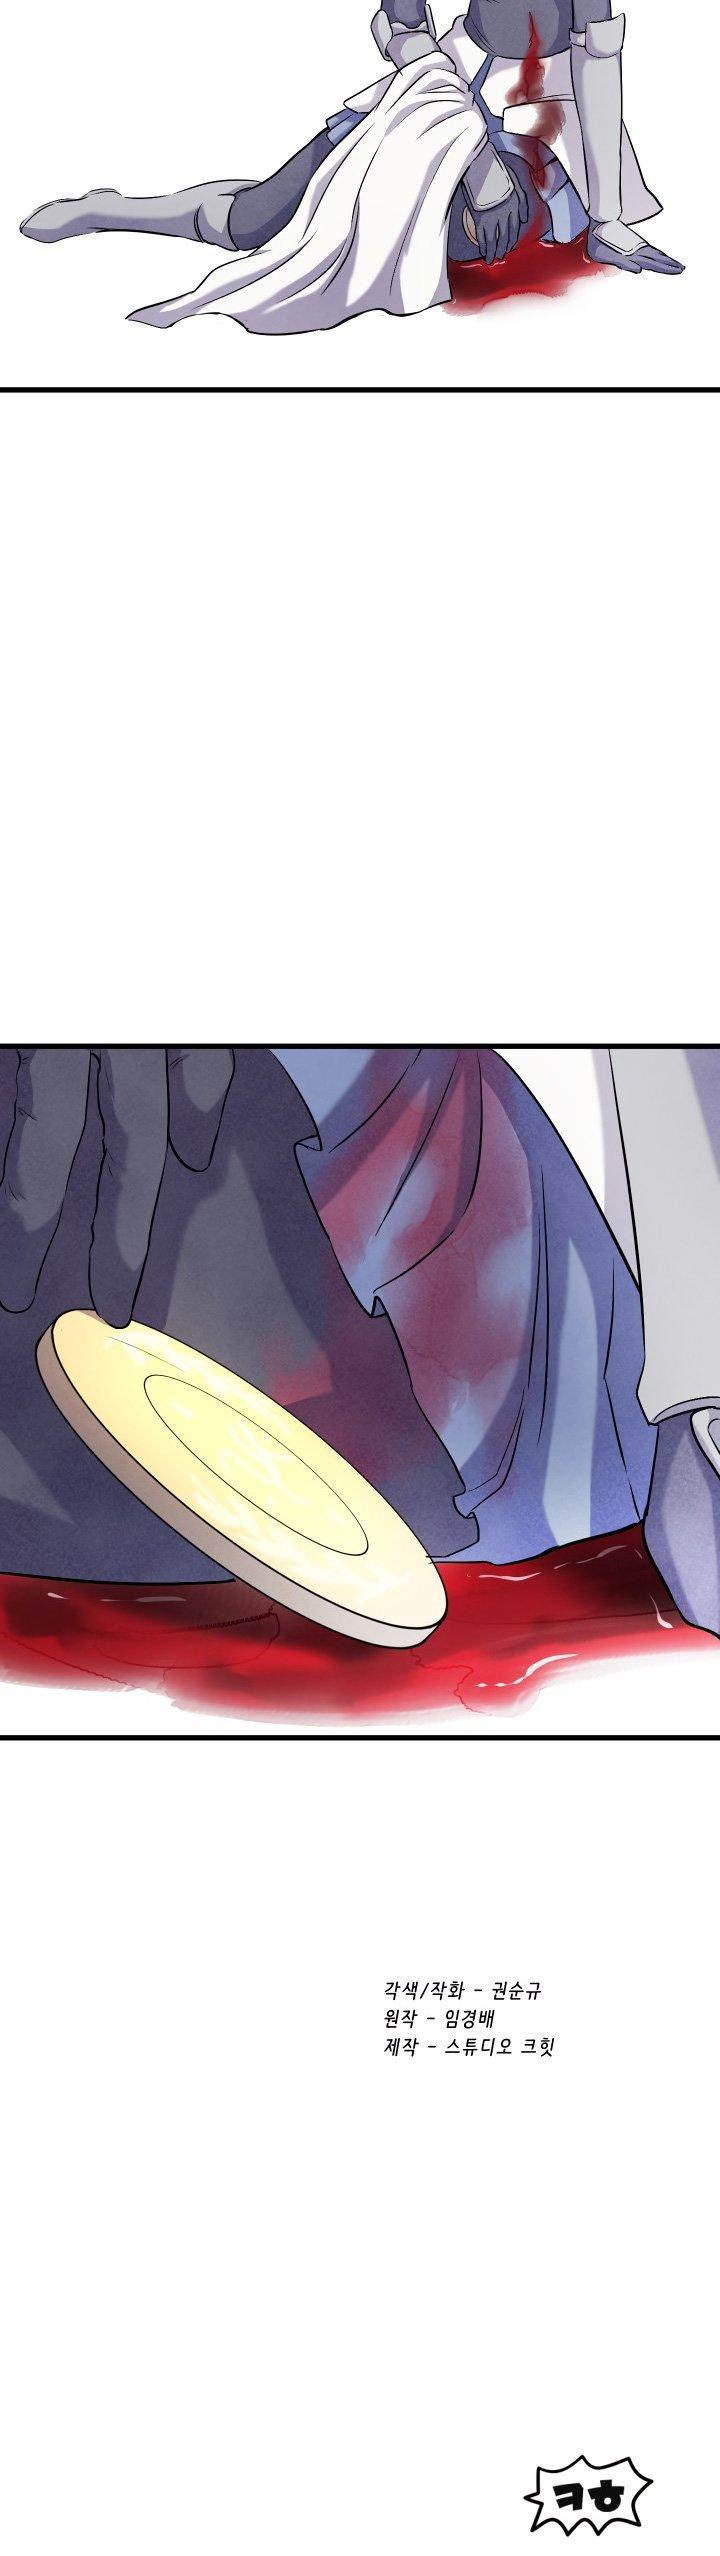 Survival Story Of A Sword King In A Fantasy World Chapter 44 page 64 - Mangakakalots.com